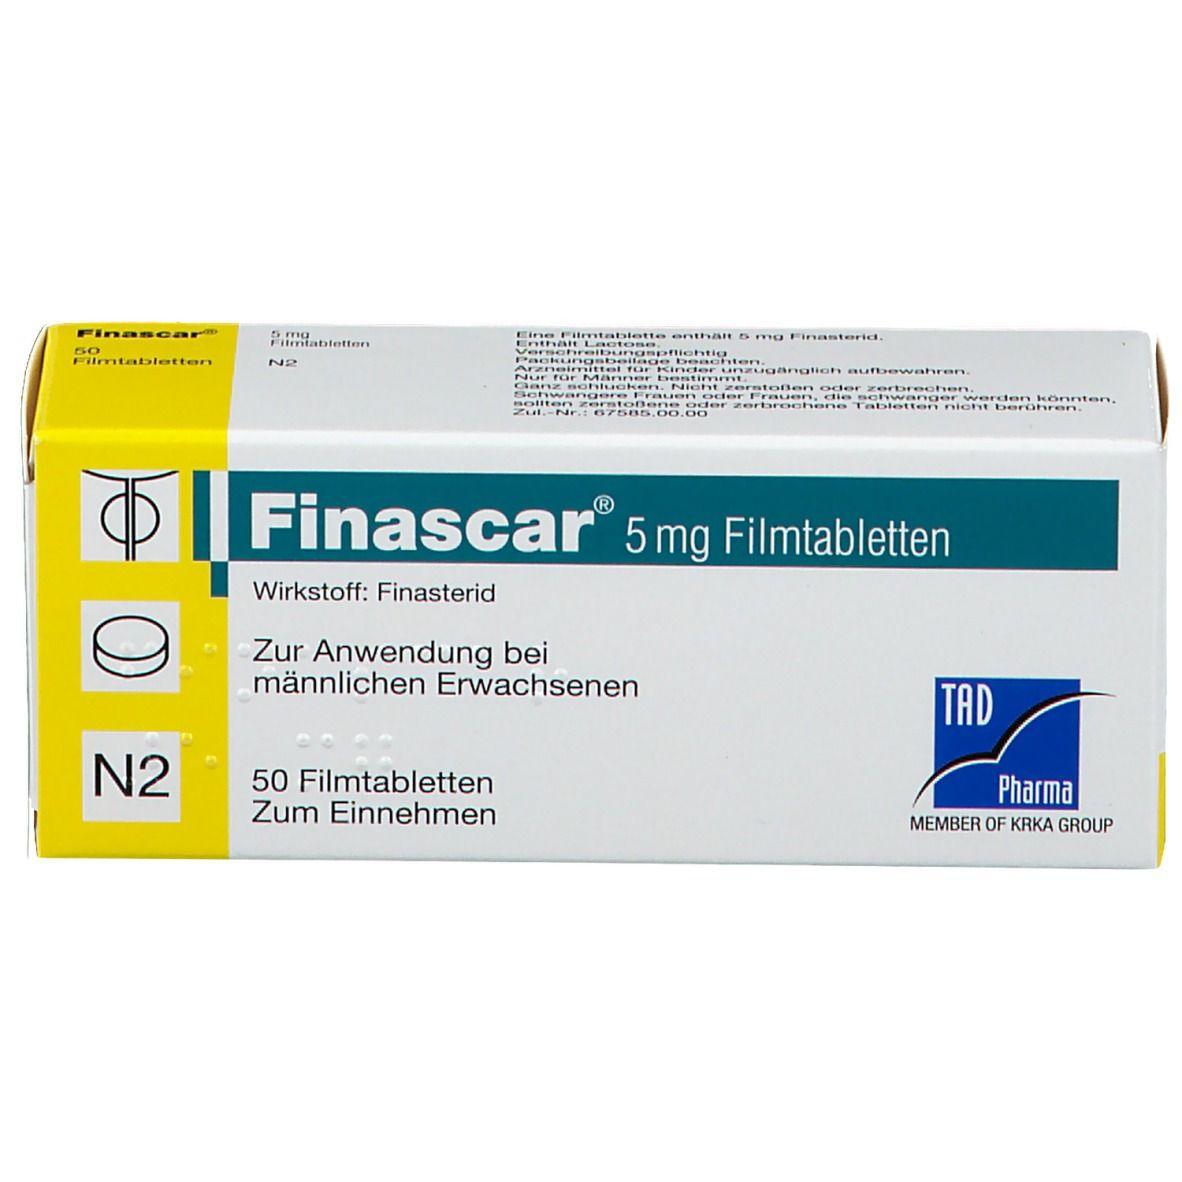 FINASCAR 5 mg Filmtabletten